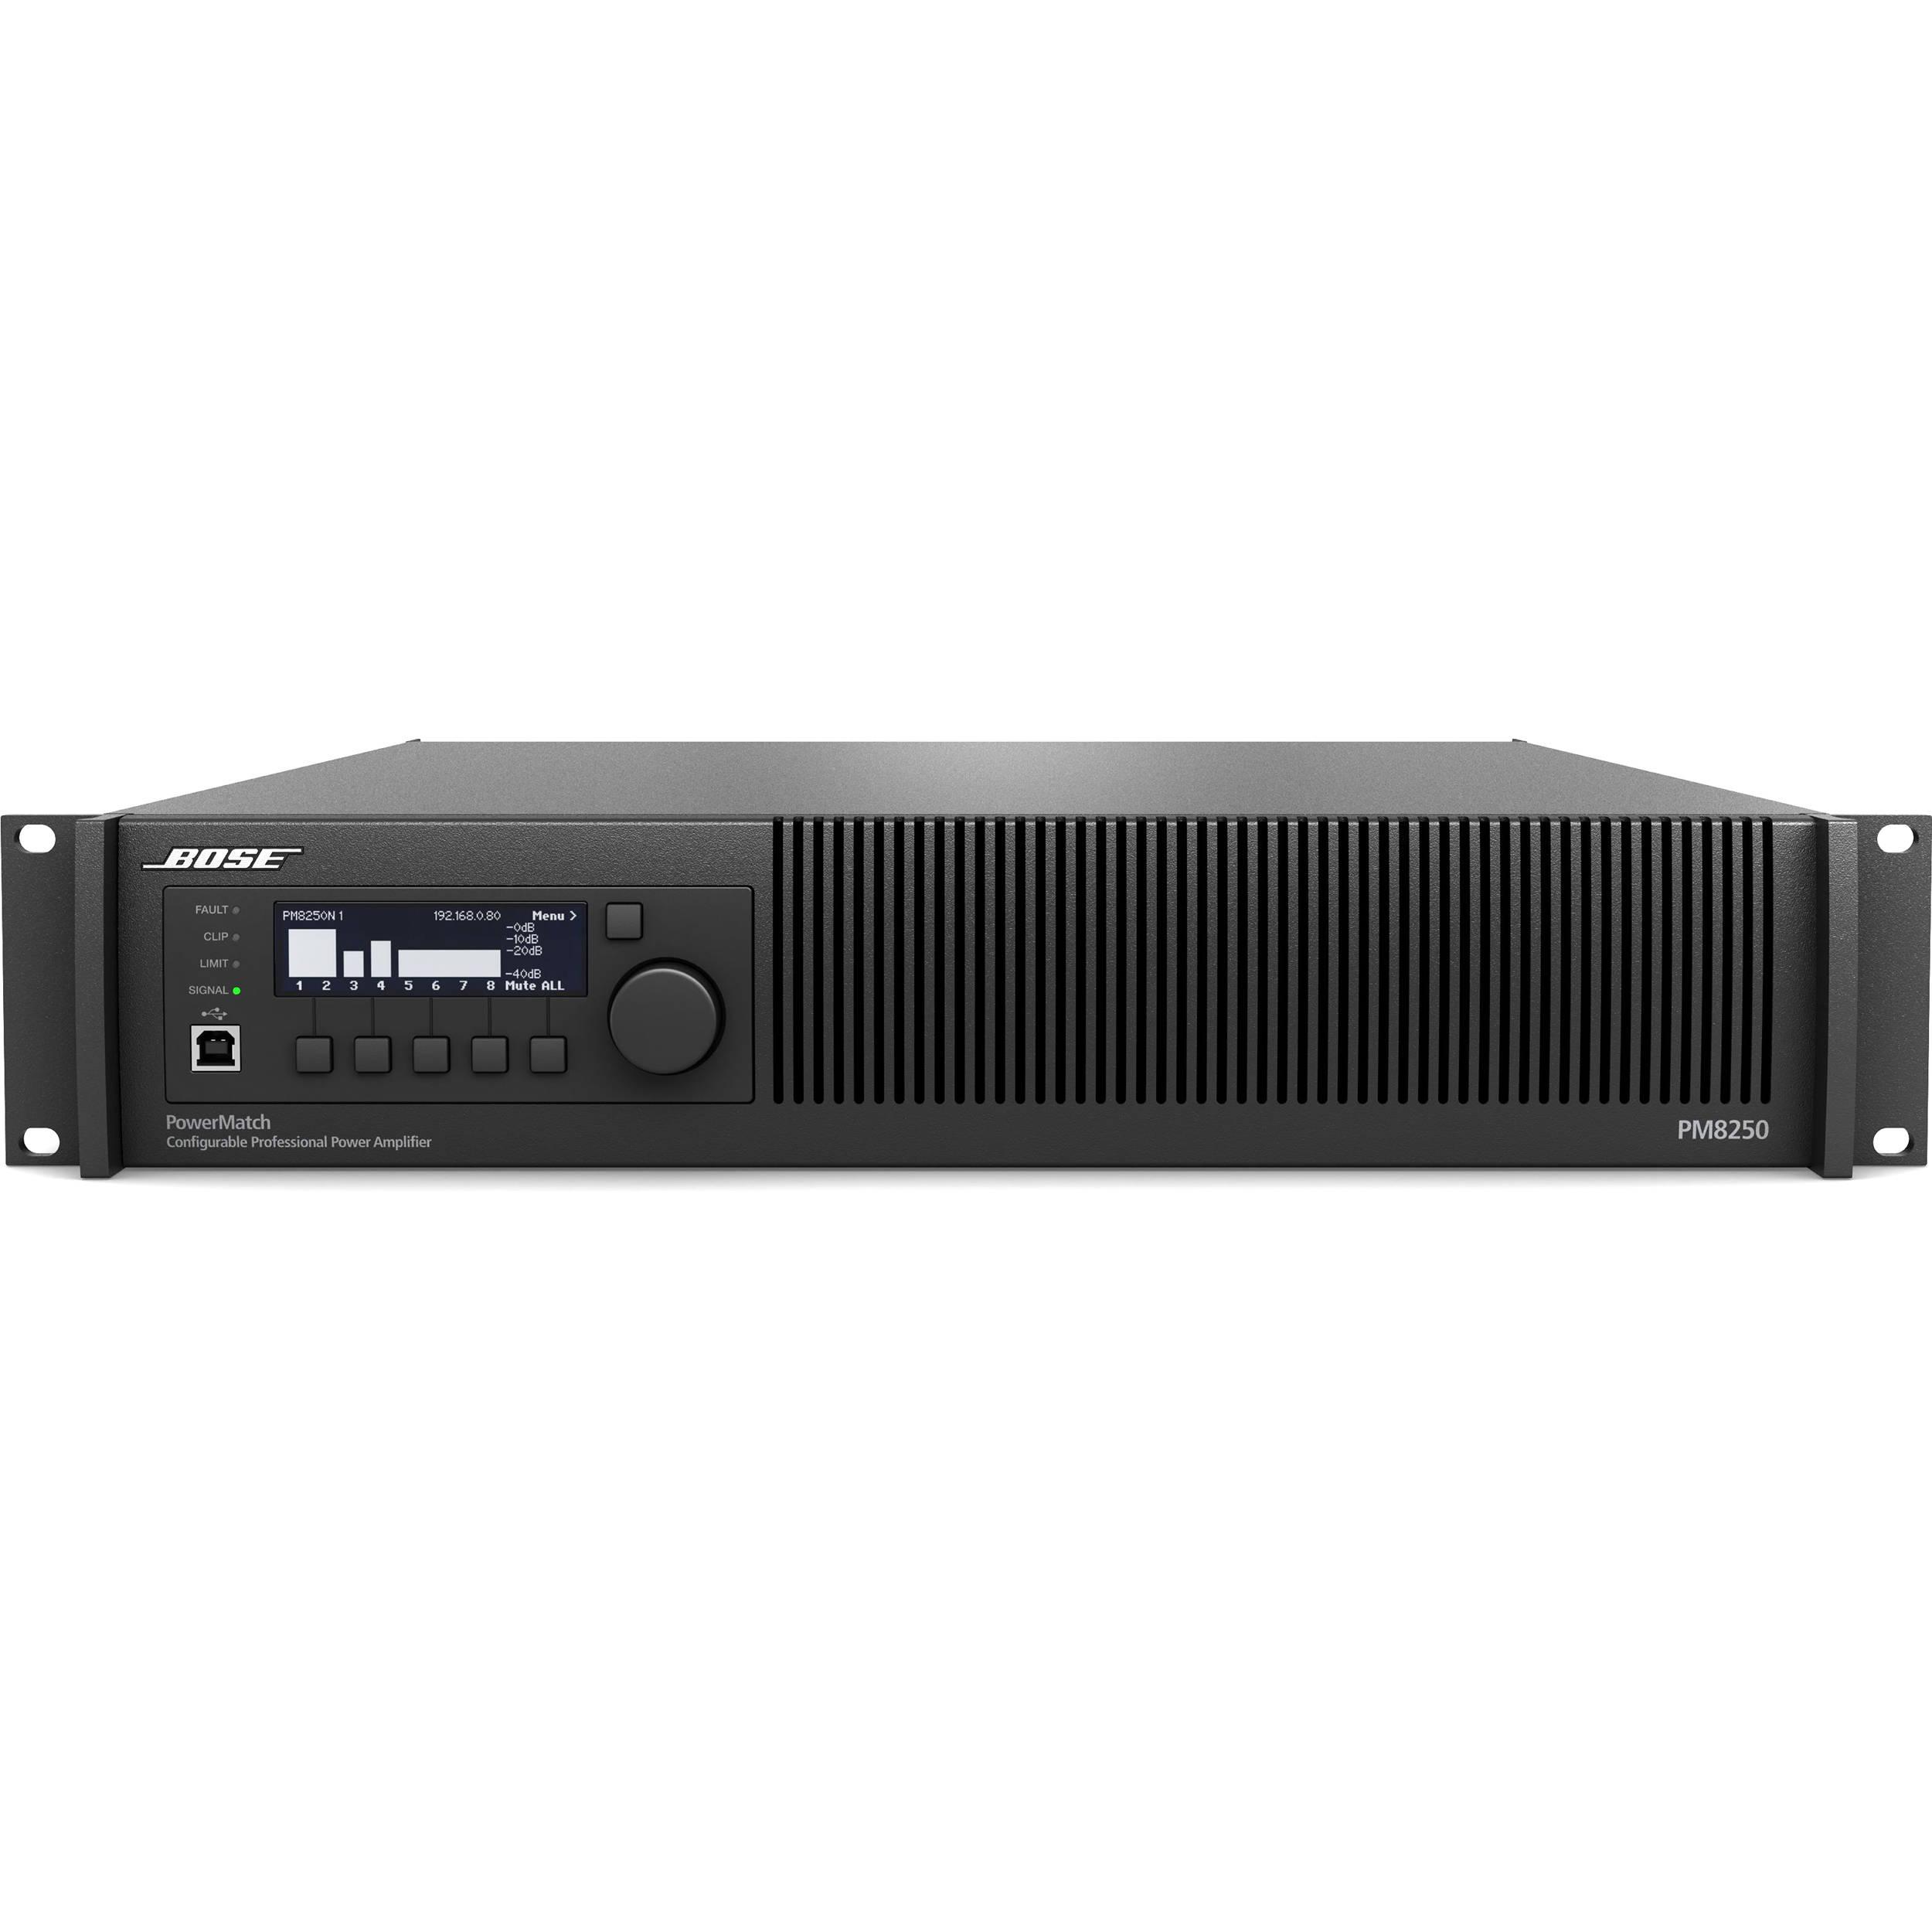 Bose Professional Powermatch Pm8250n Power Amplifier 361810 1110 45 Watt Class B Audio With Ethernet Network Control 2ru